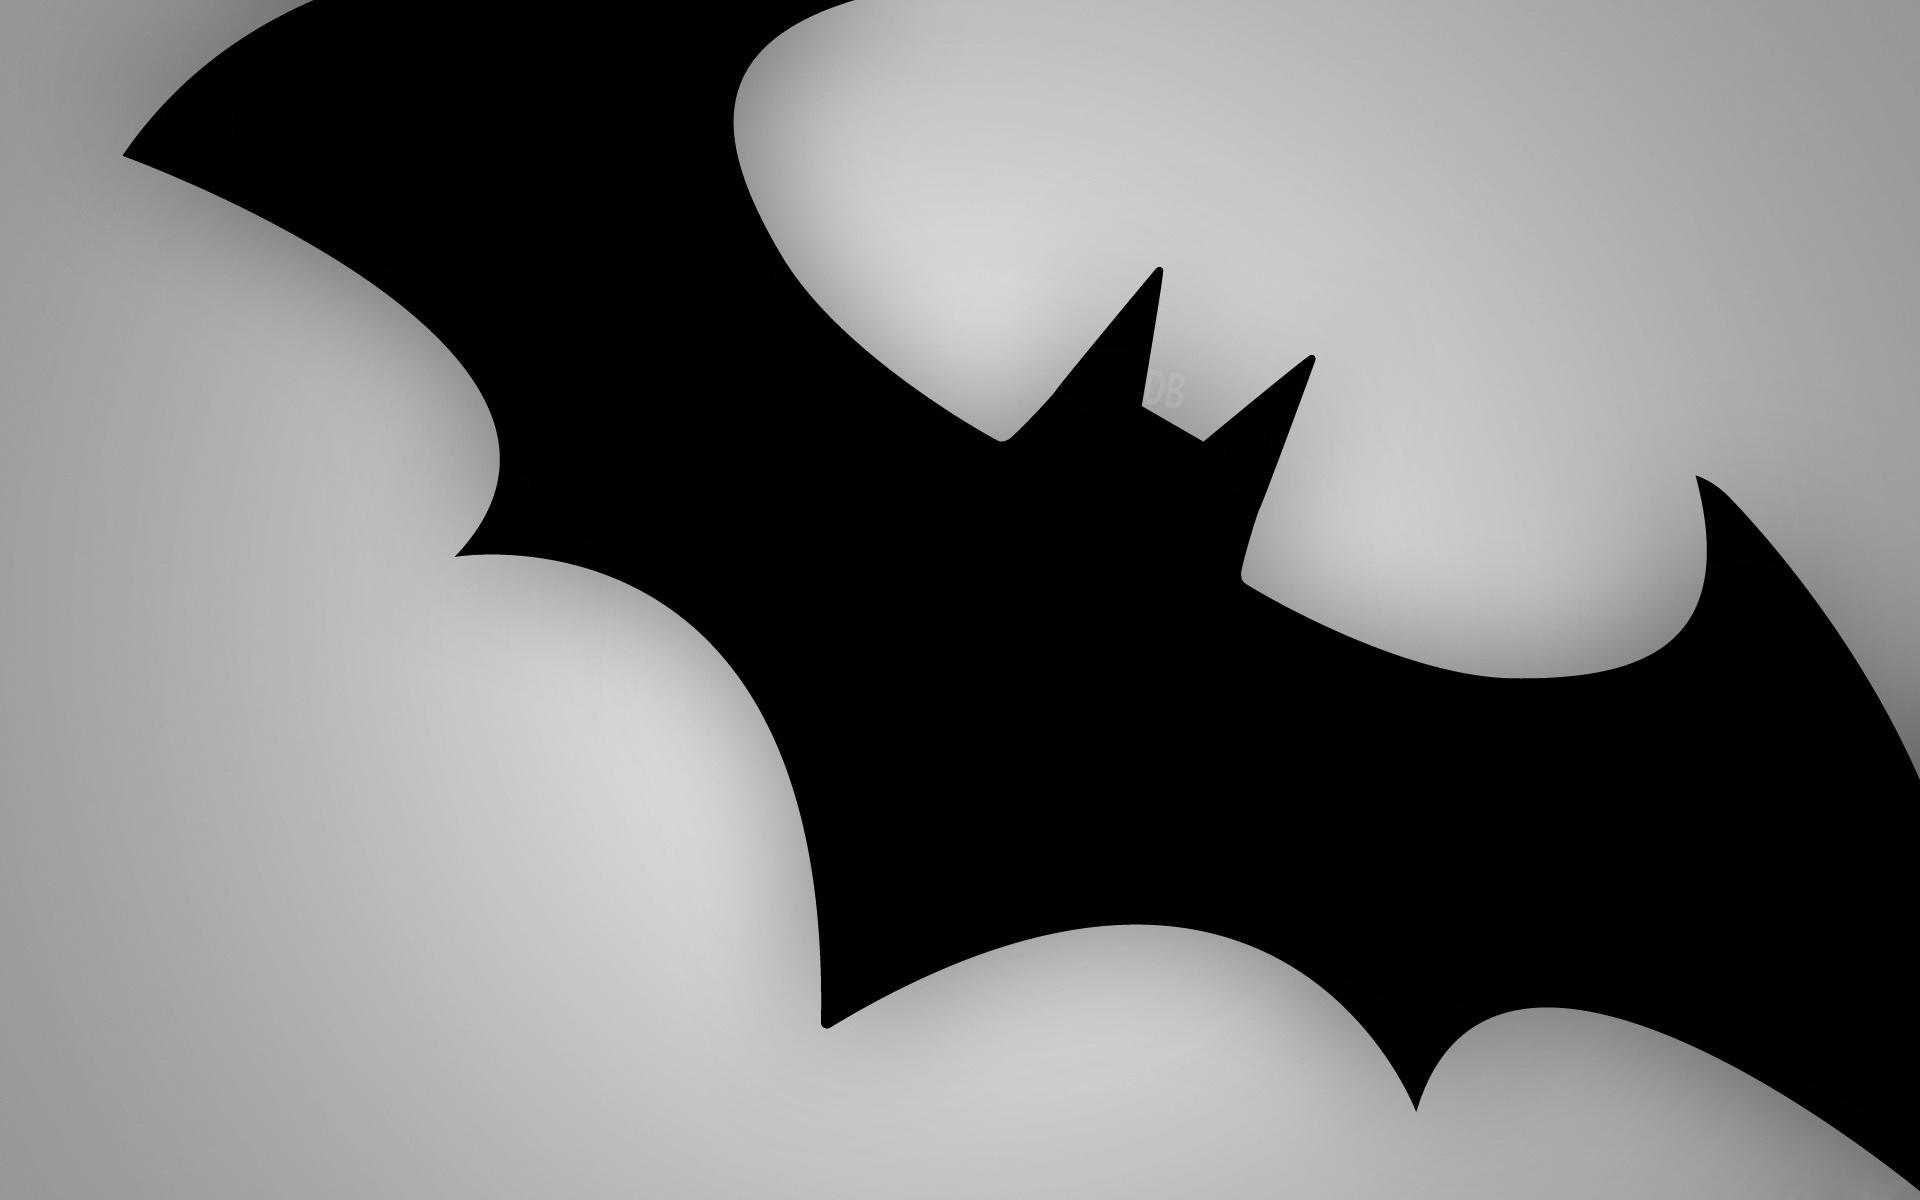 cool batman logo 31551